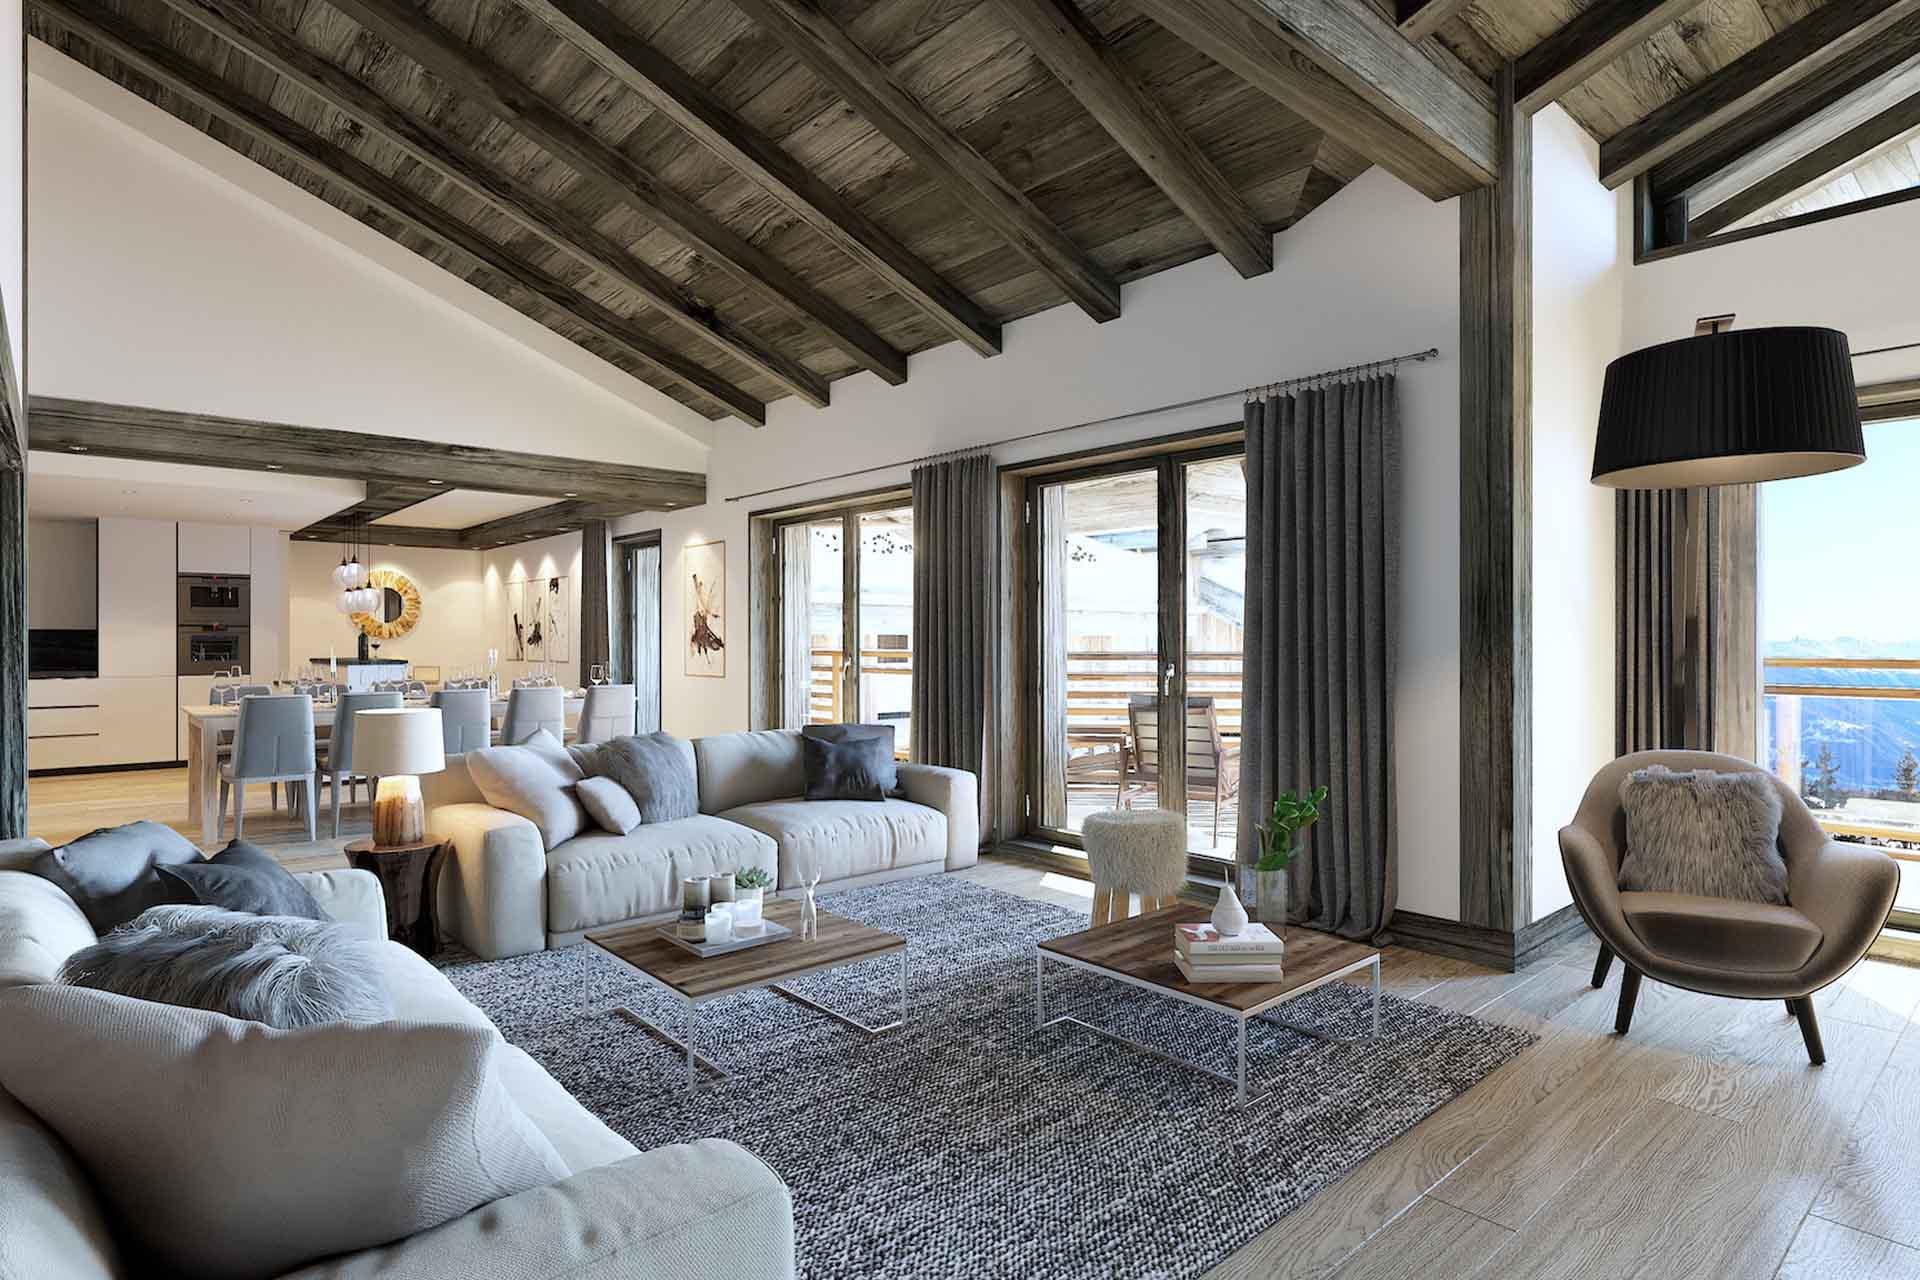 Appt 1 eagle lodge tignes les brevieres free spirit alpine - Appartement de luxe ando studio ...